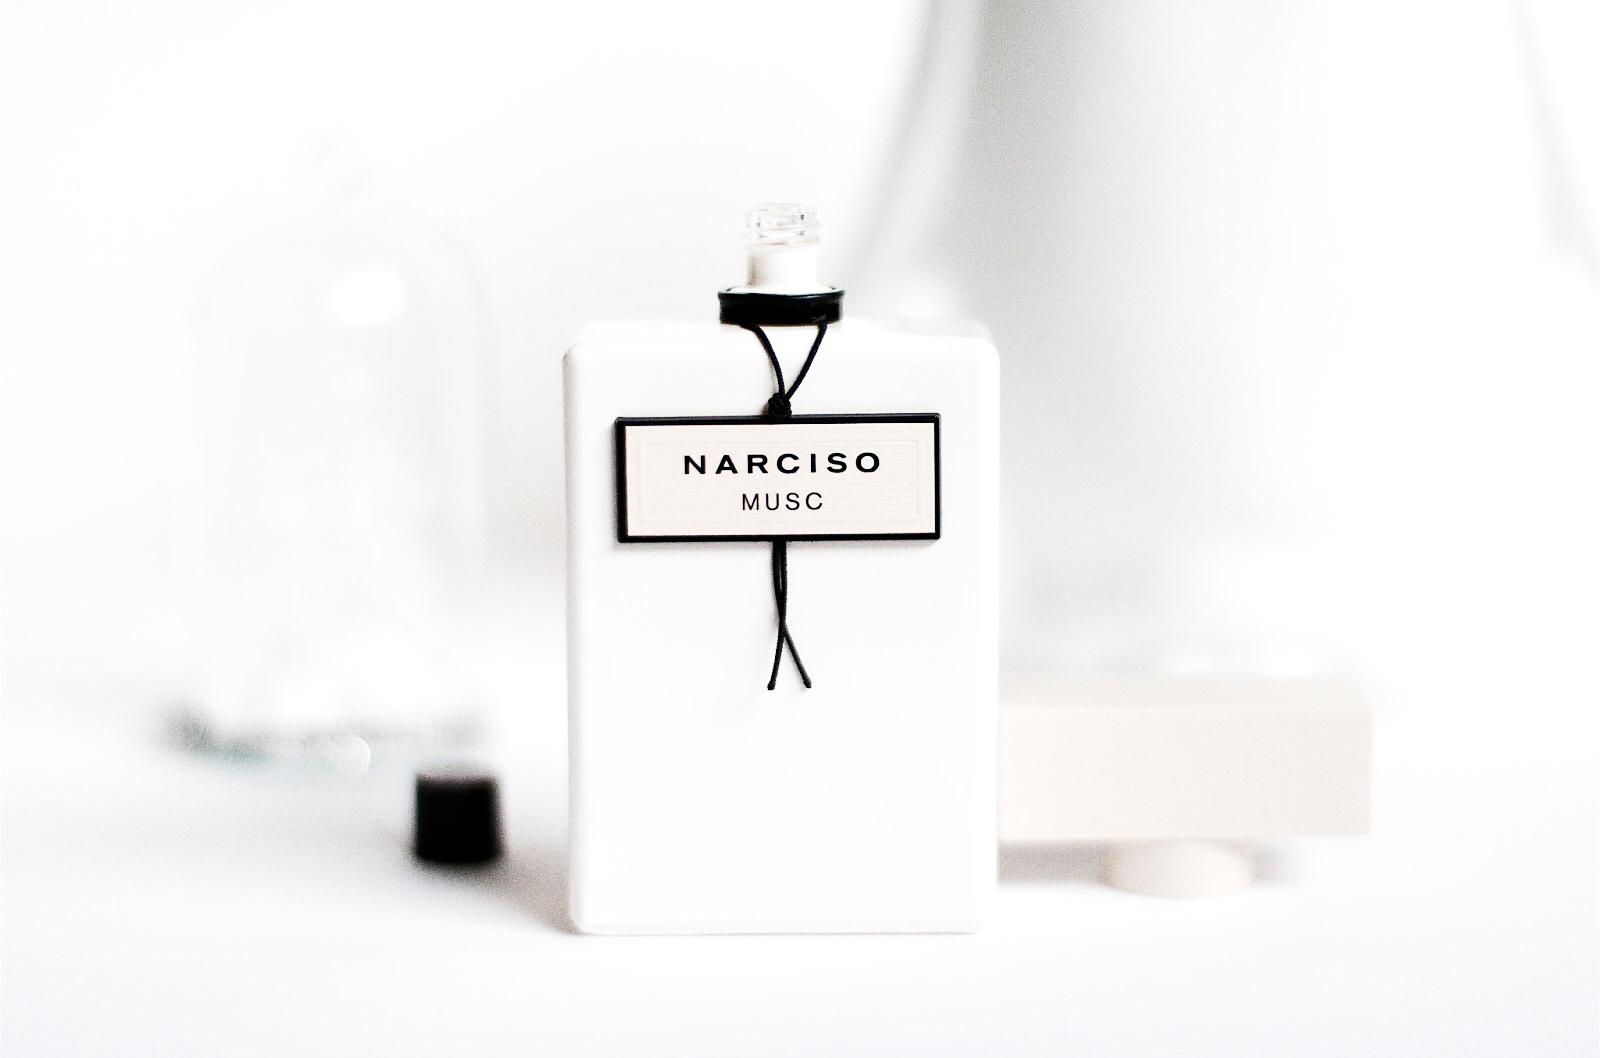 narviso musk huile de parfum avis test